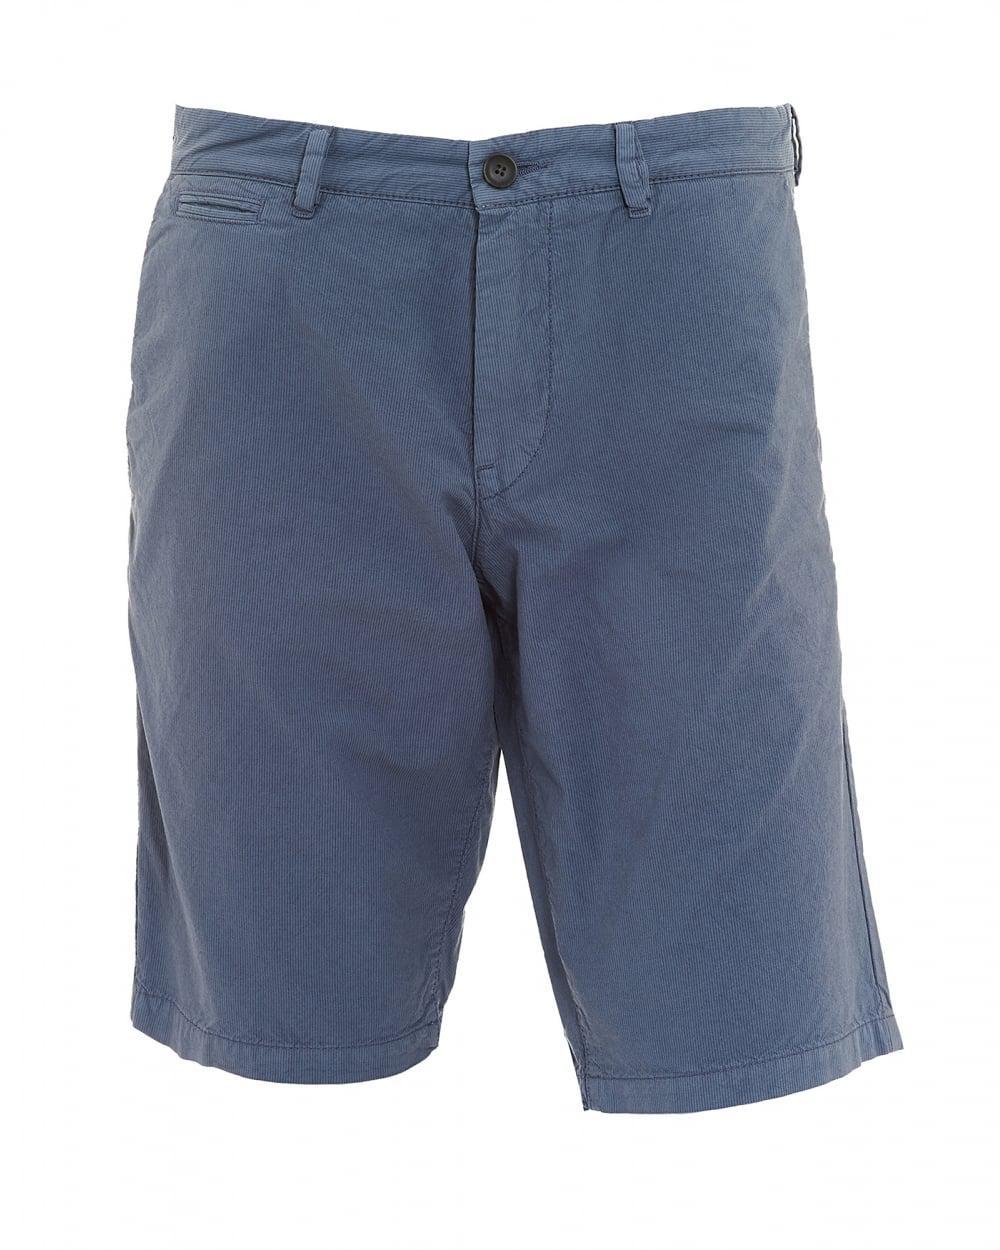 eb73f20c2 BOSS Slim4-shorts-d-eosp Stripe Cotton Grey Shorts in Gray for Men ...